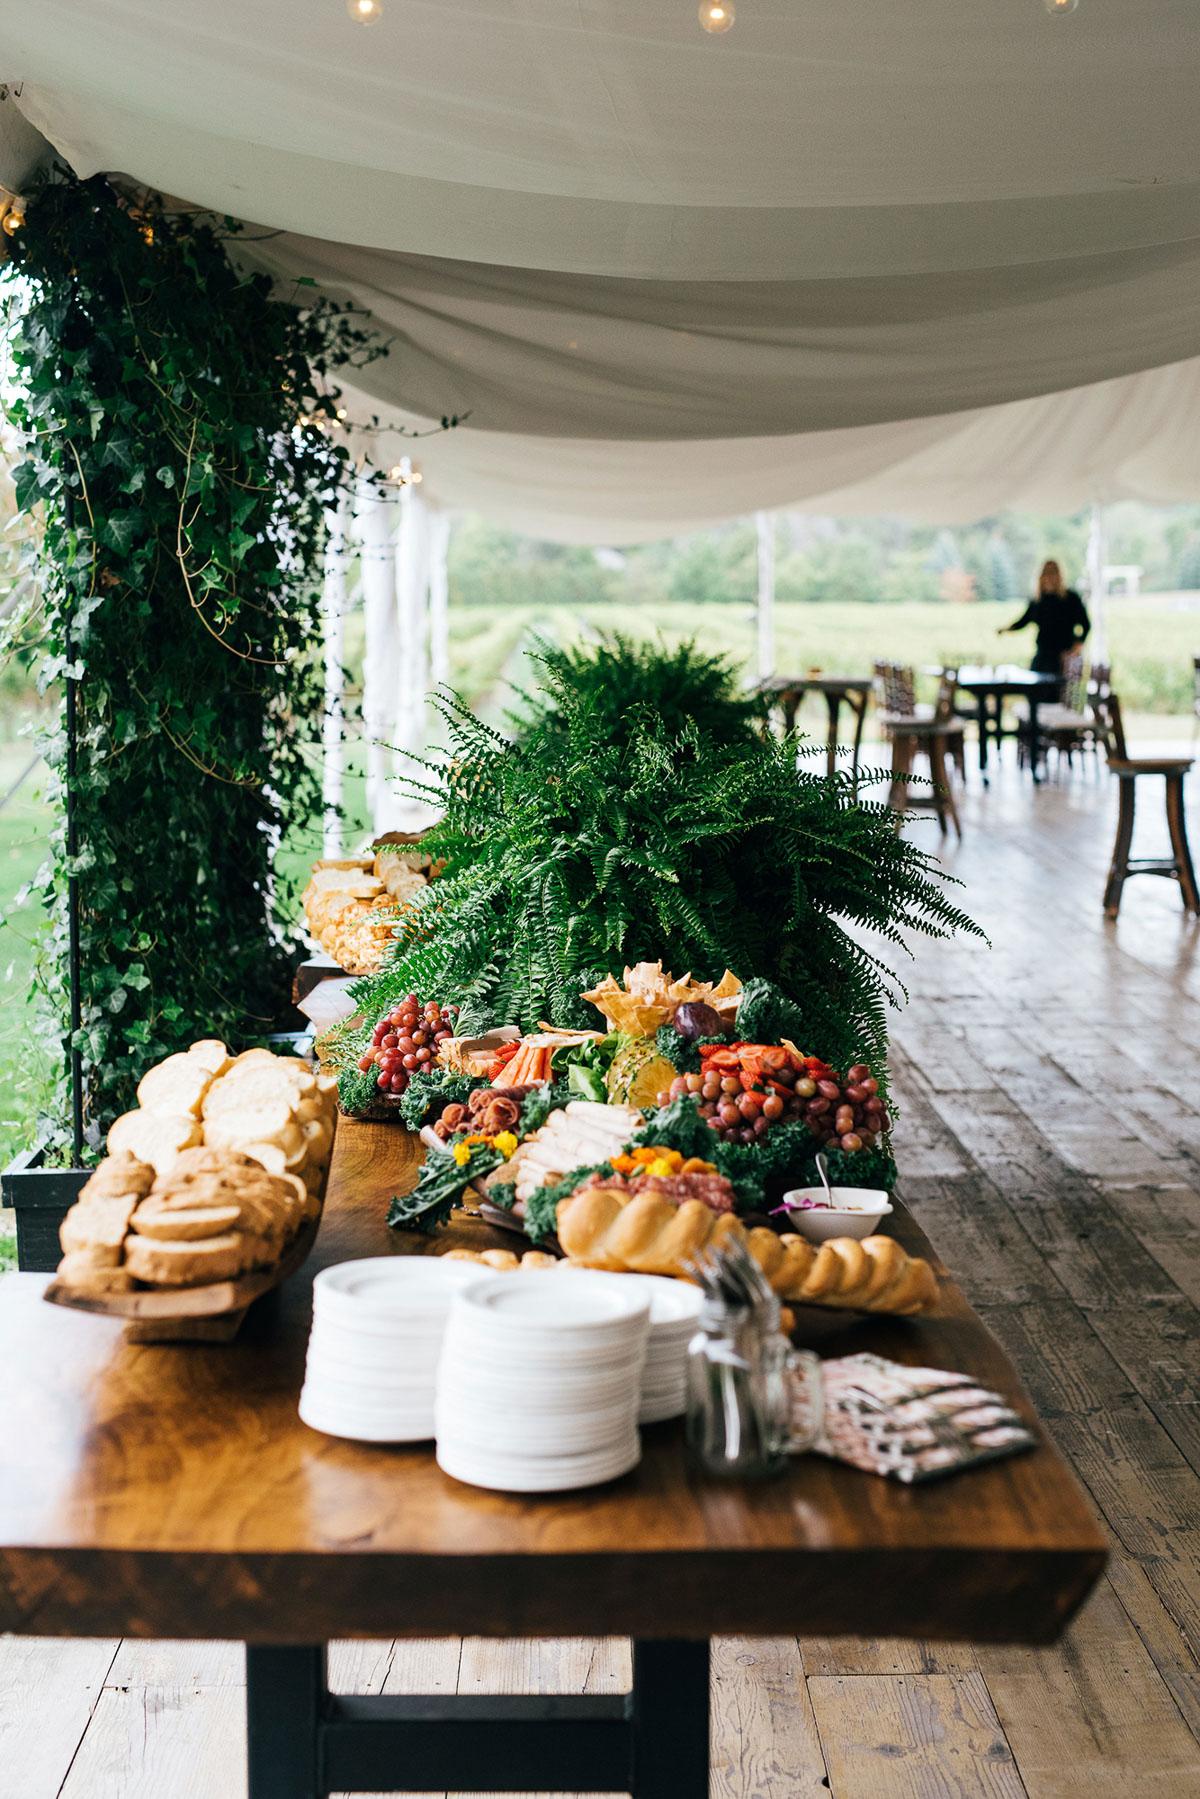 shaw-events-vineyard-bride-swish-list-kurtz-orchards-niagara-on-the-lake-wedding-3.jpg